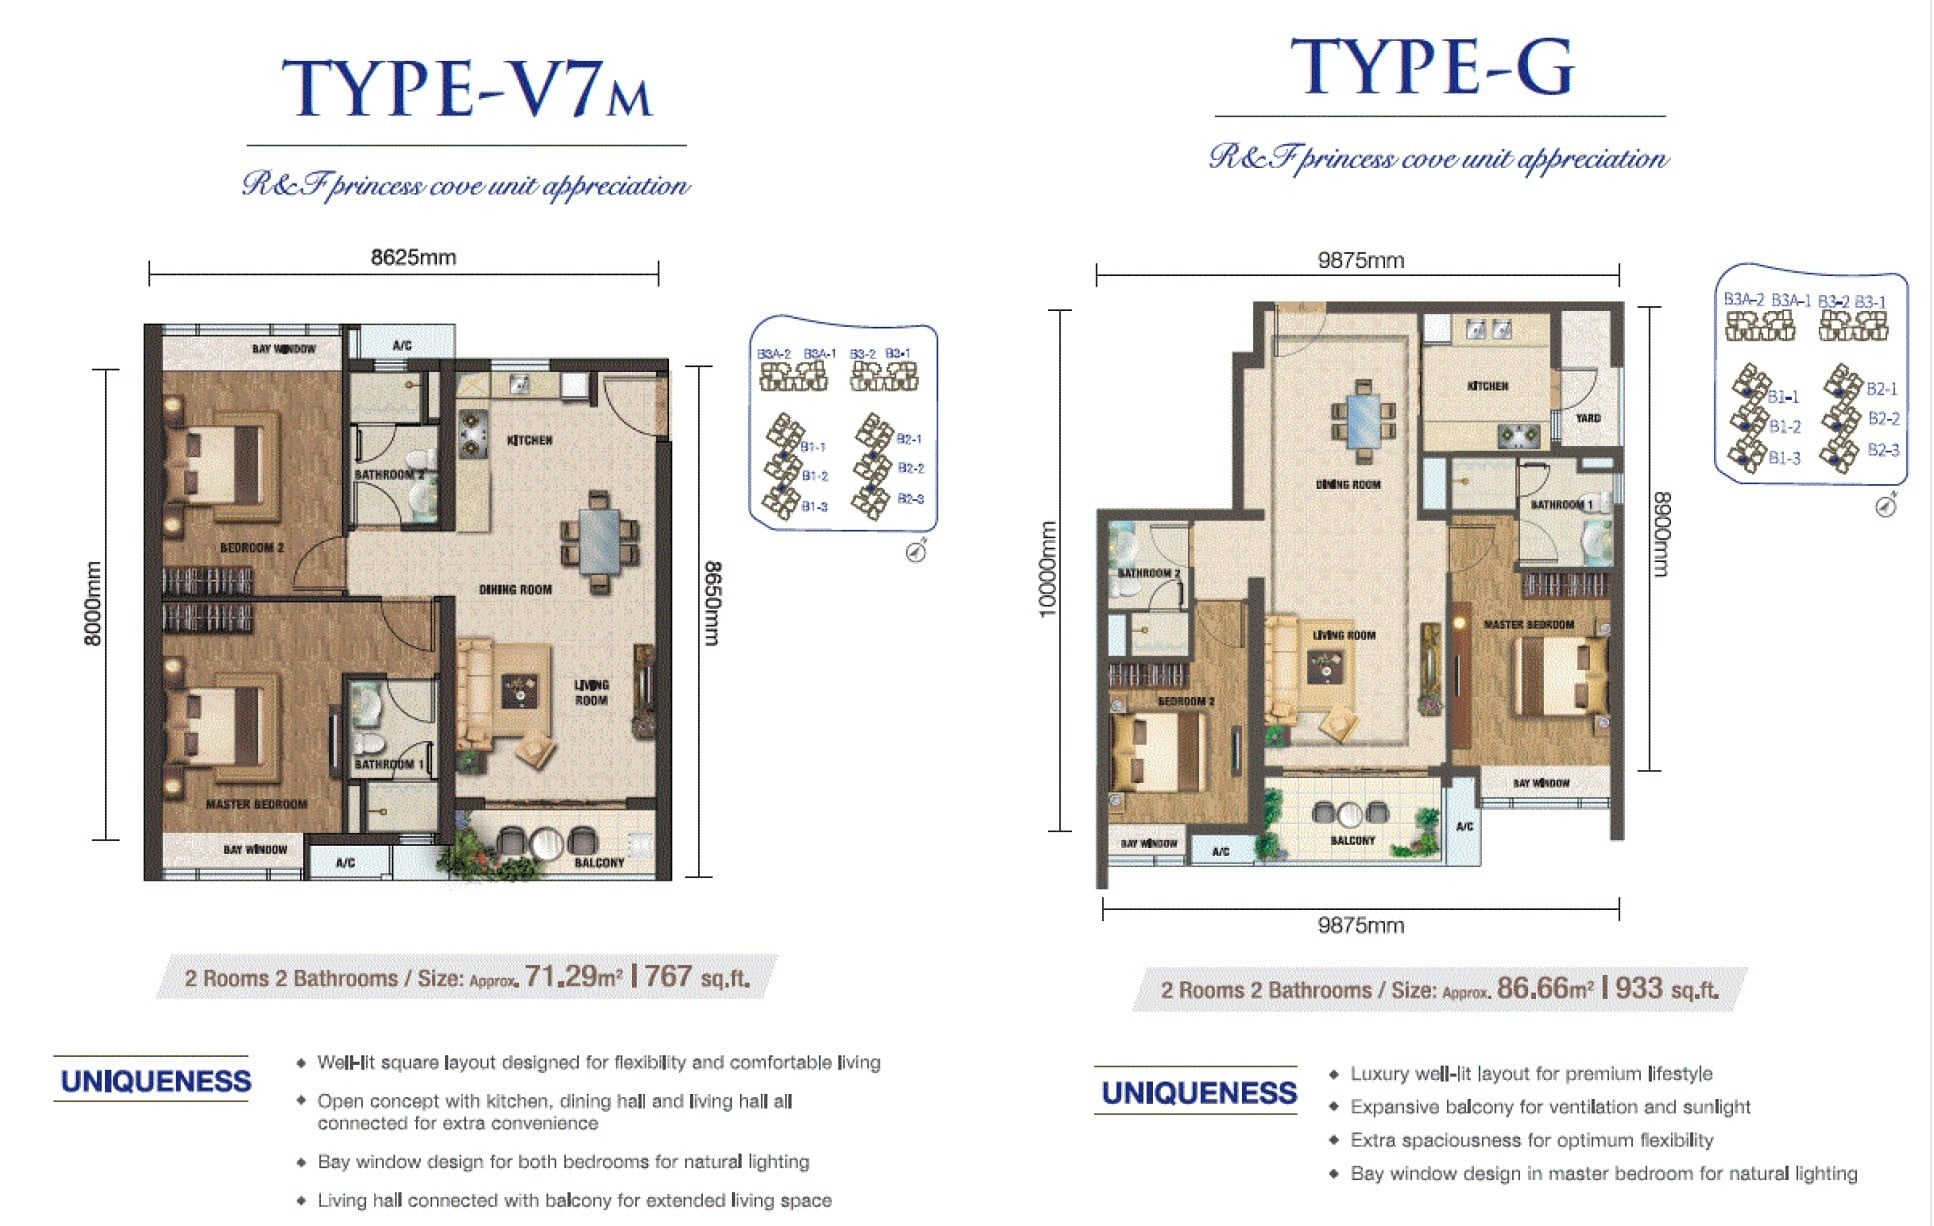 RF Princess Cove JB Floor Plan 2Bedroom